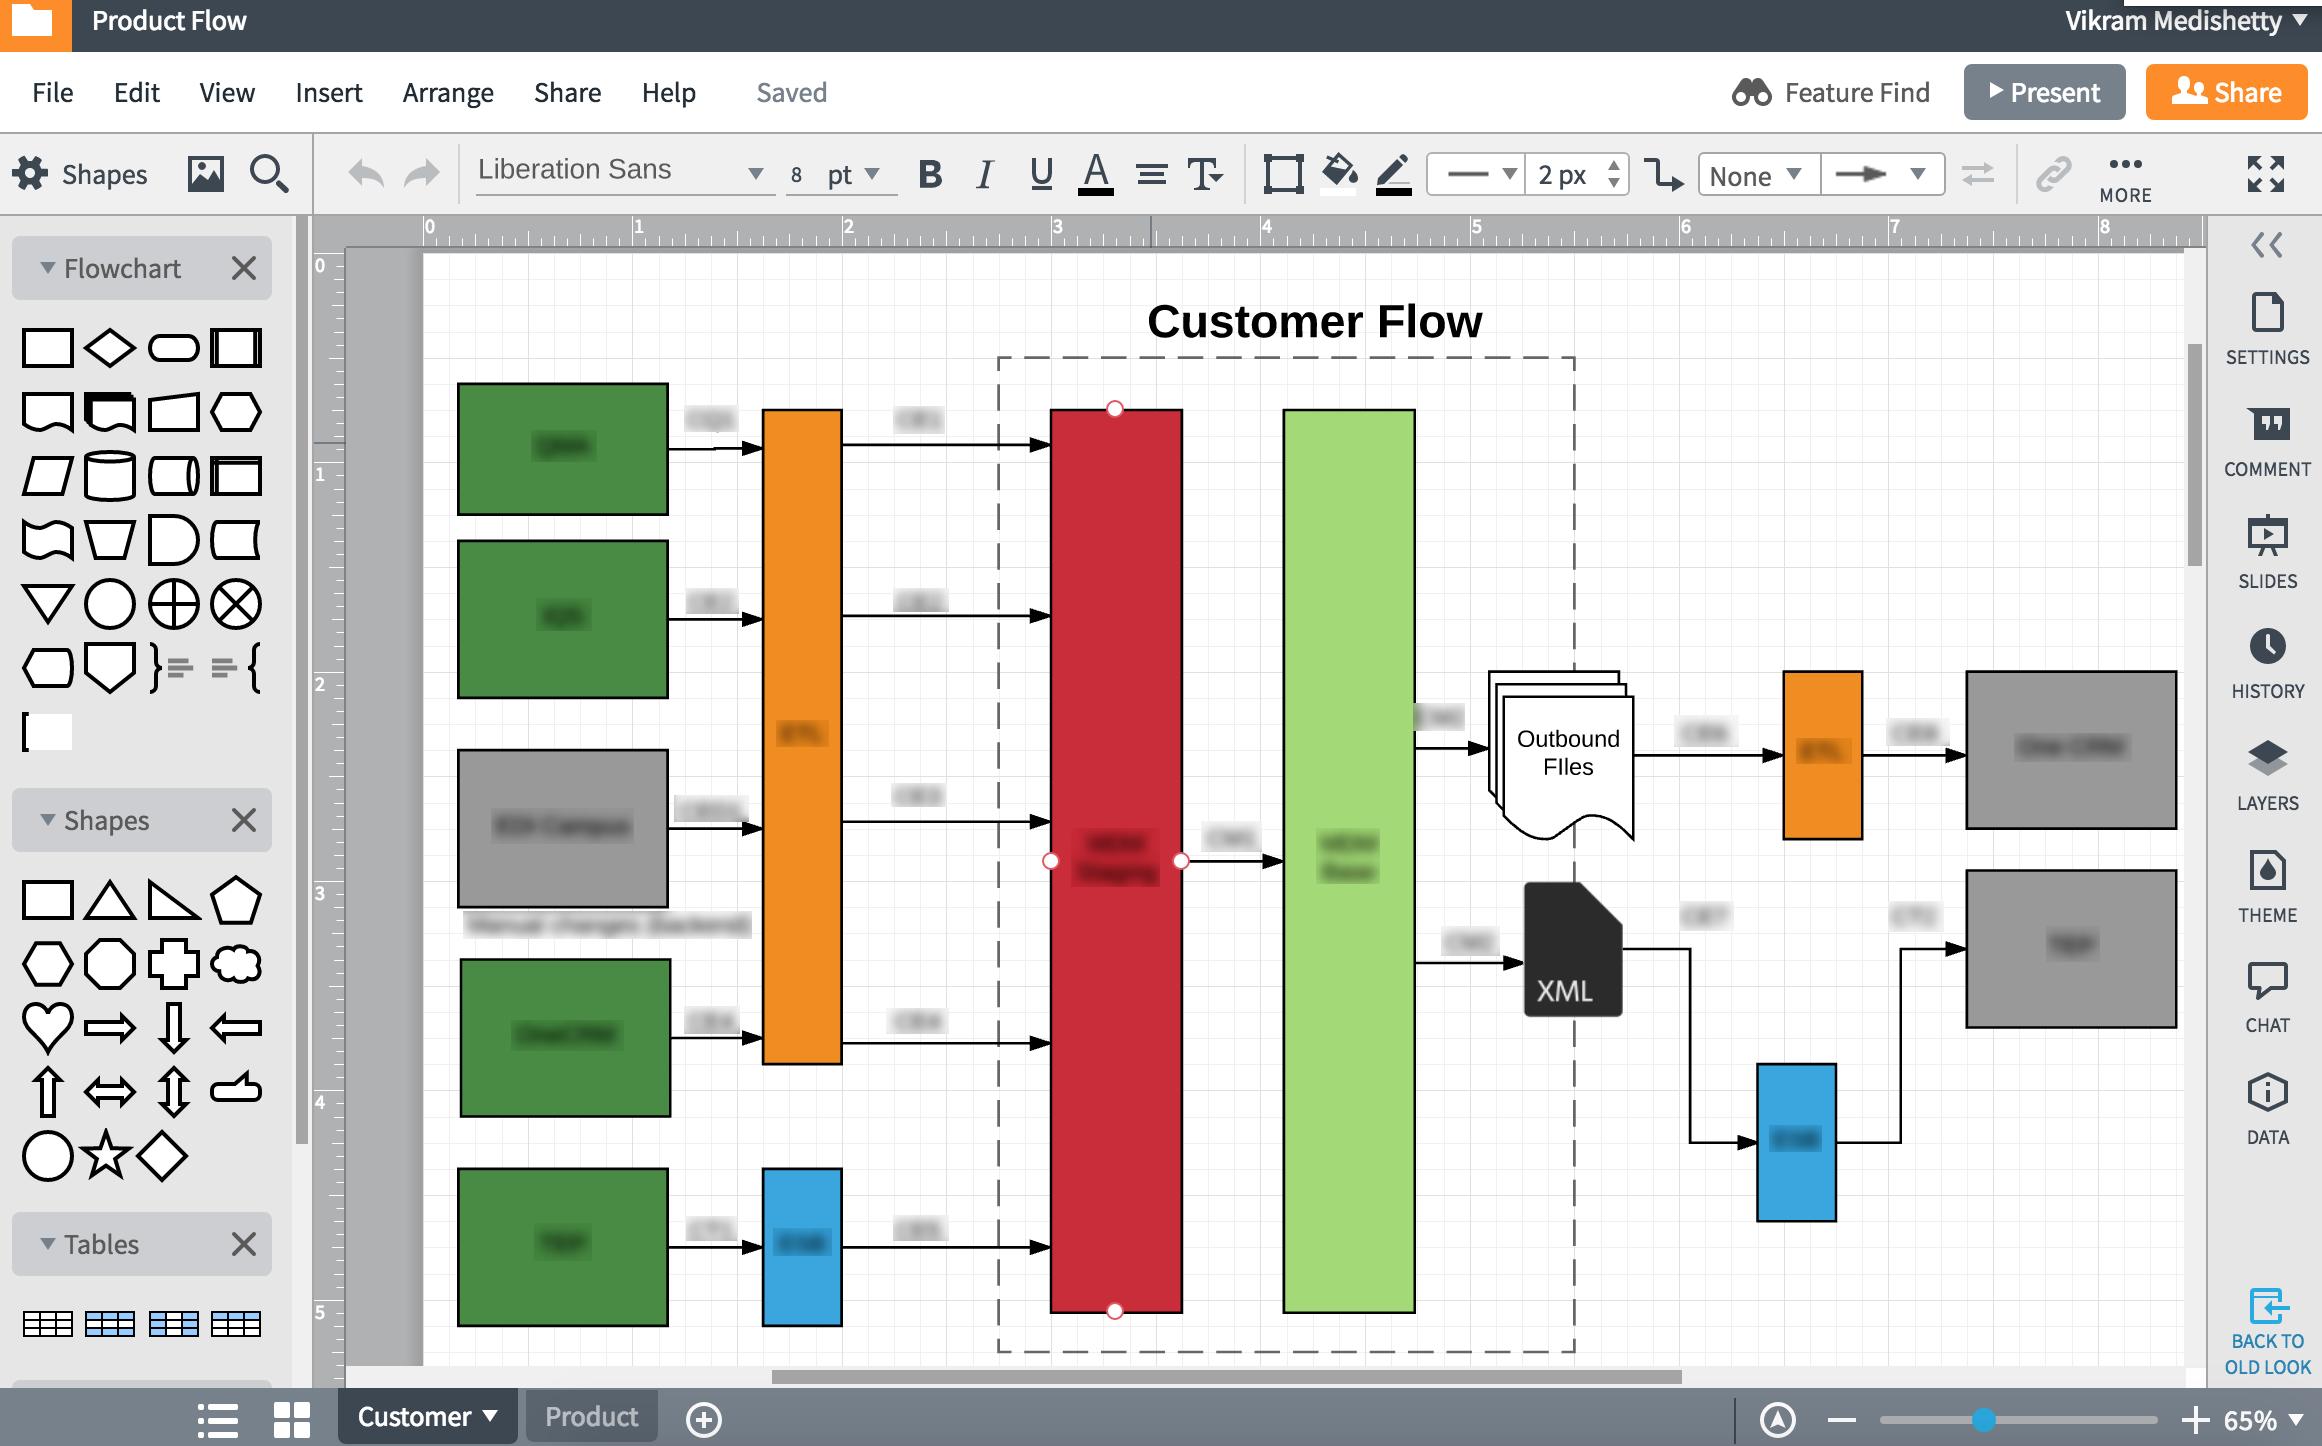 Download Lucidchart For Chrome - Create Flowcharts, Diagrams